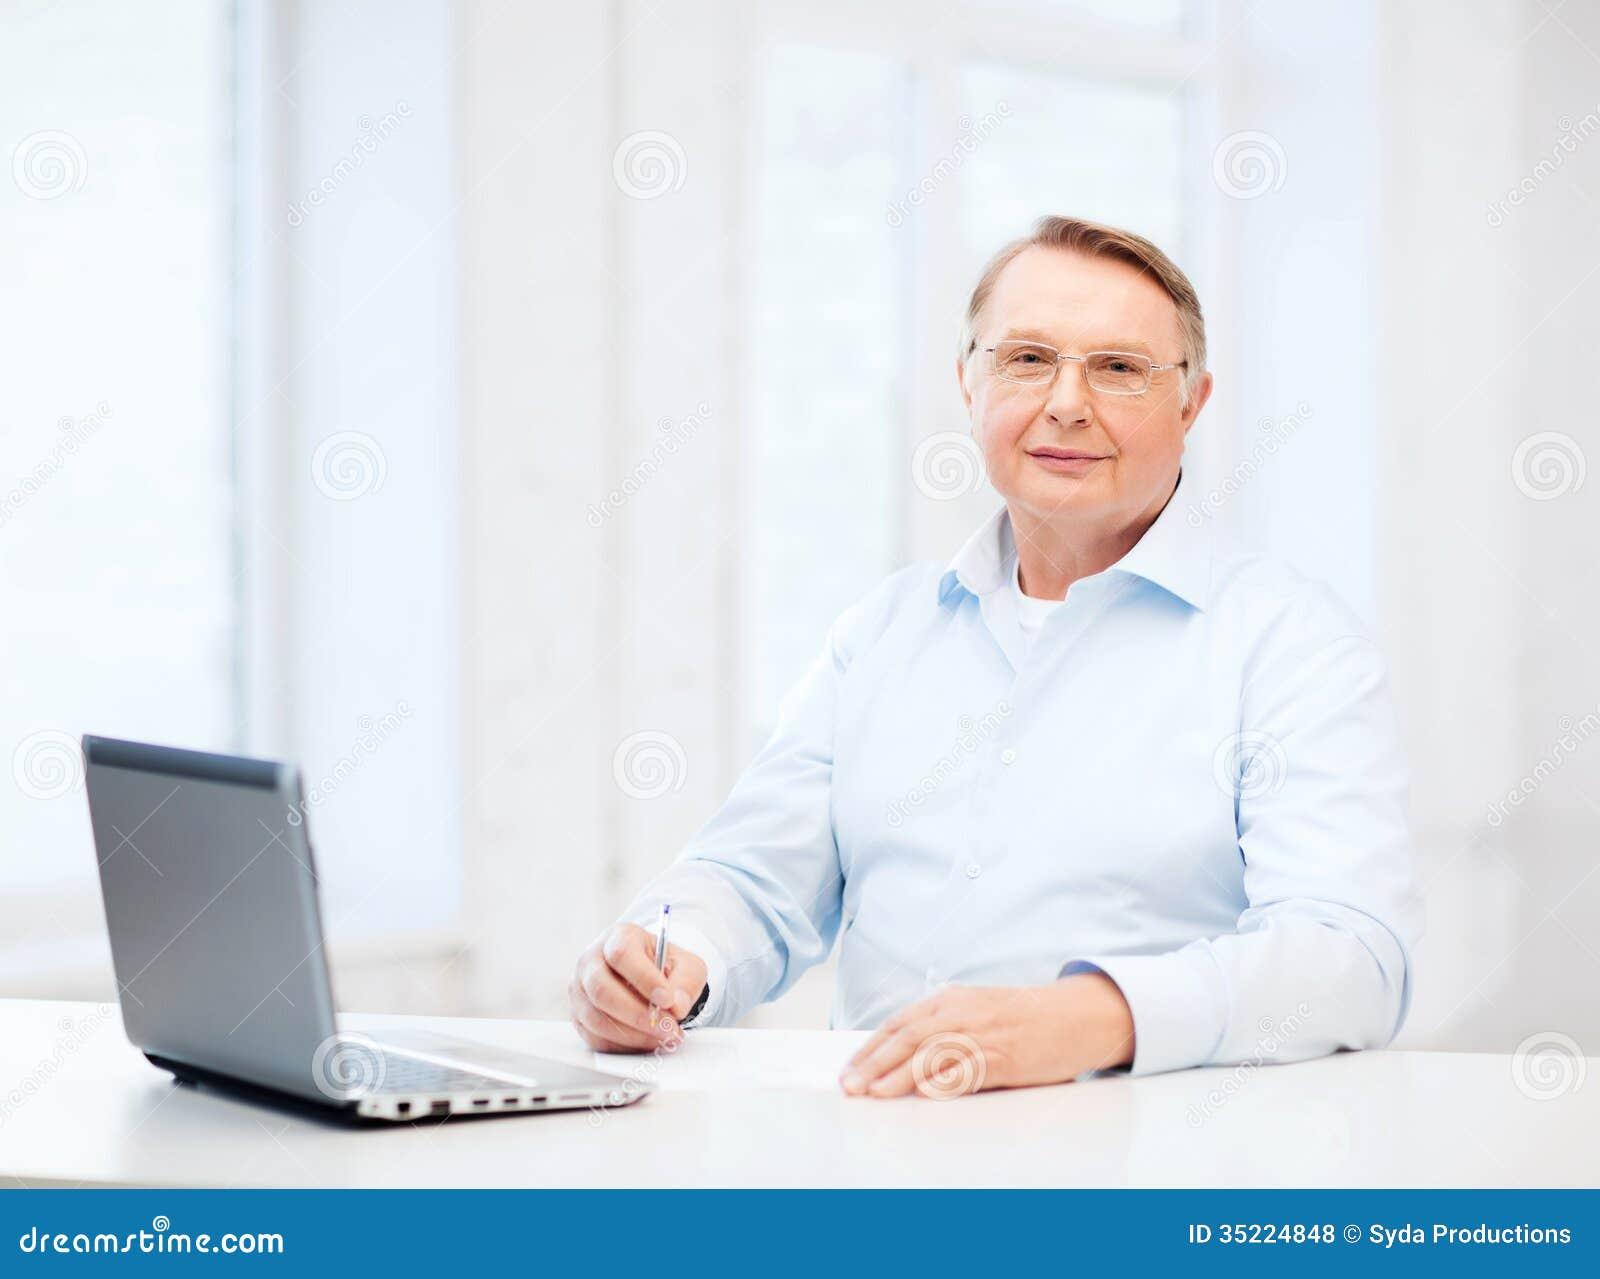 old man in eyeglasses filling a form at home royalty free stock photos image 35224848. Black Bedroom Furniture Sets. Home Design Ideas